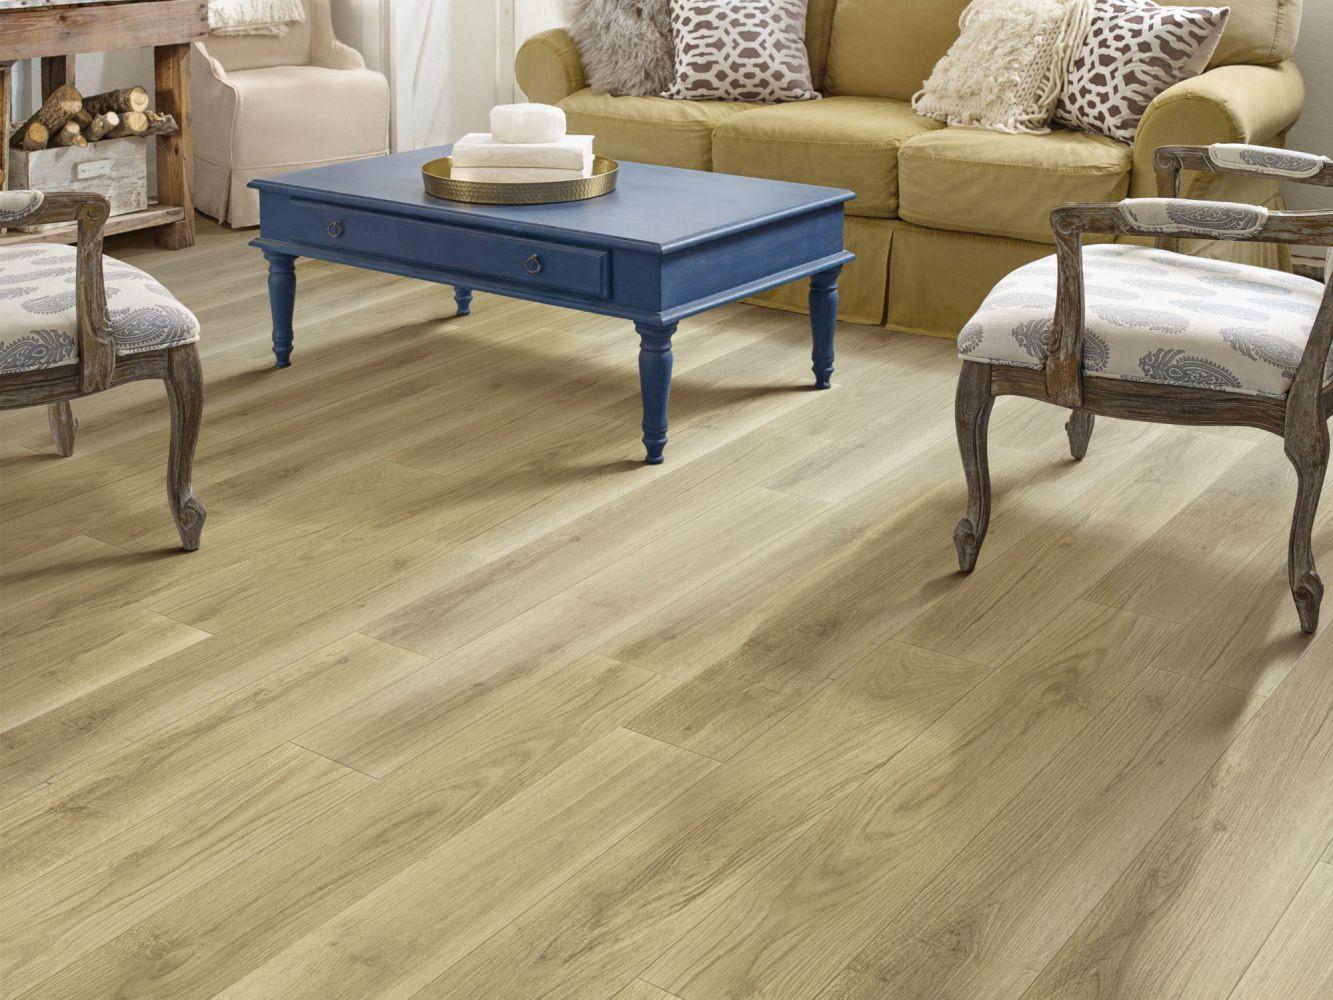 Shaw Floors Resilient Property Solutions Lazio Plus Rococo 00265_VE230